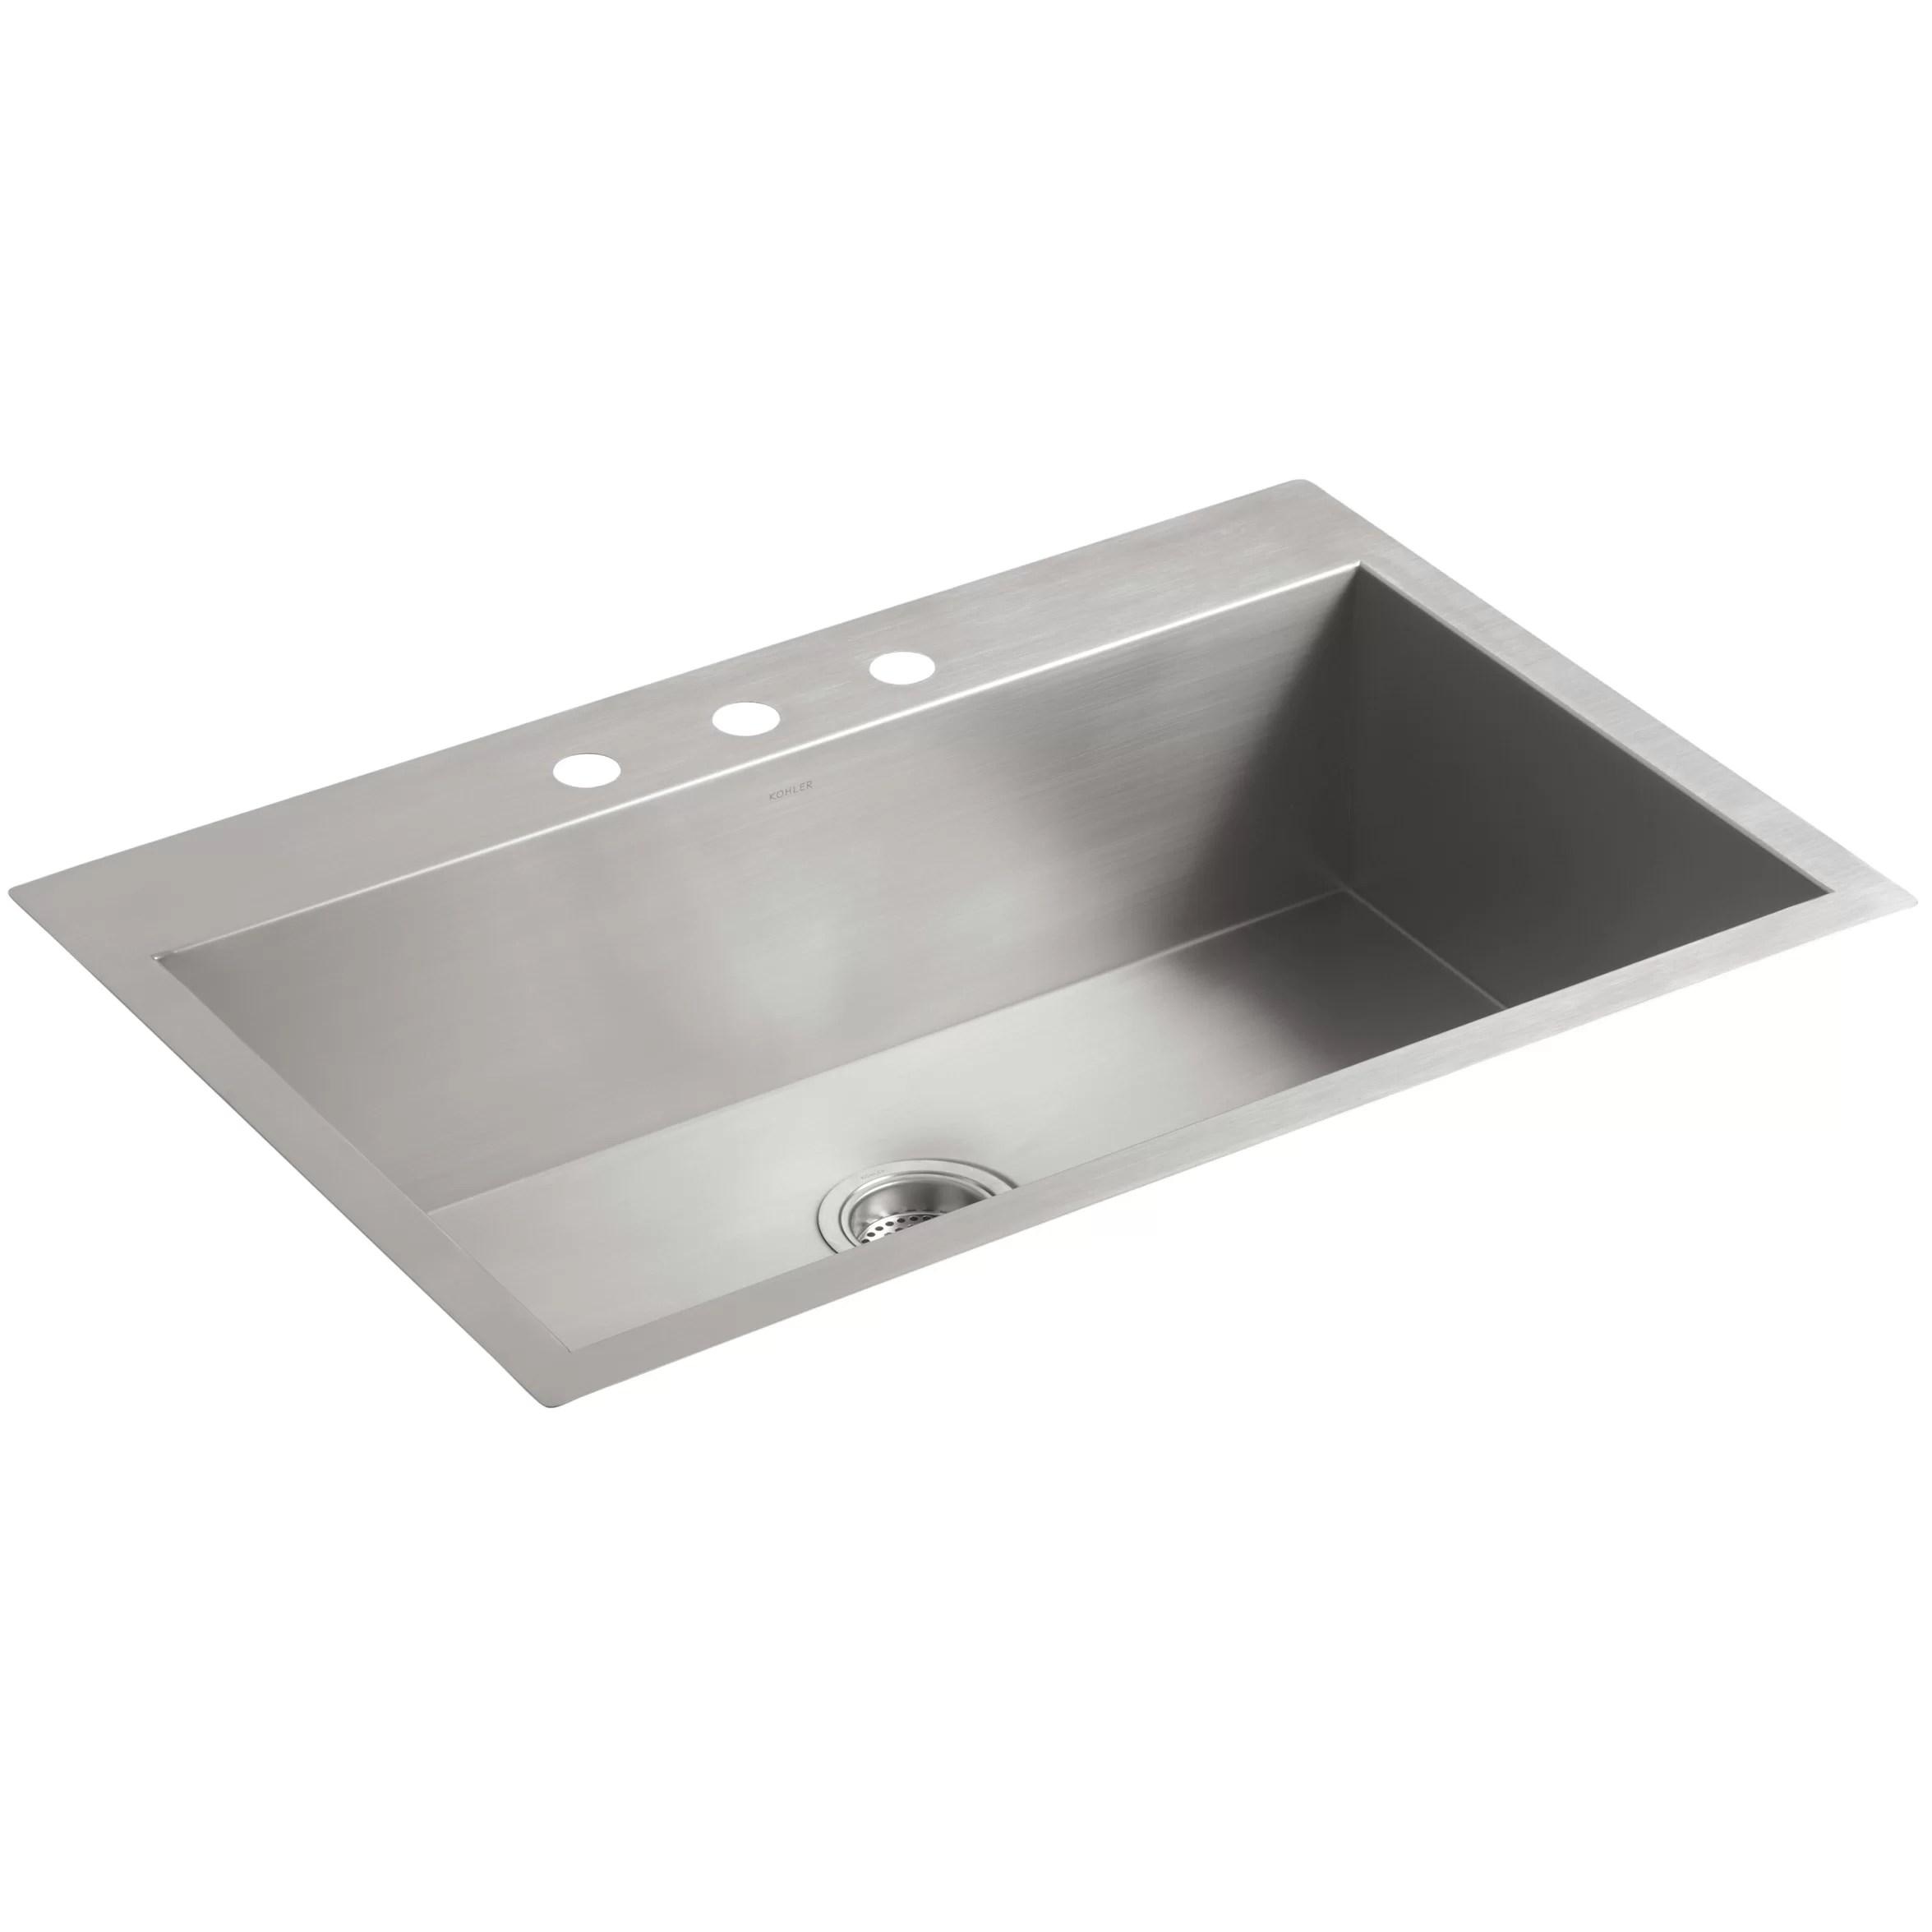 single bowl kitchen sinks american standard sink kohler vault 33 quot x 22 9 5 16 top mount under